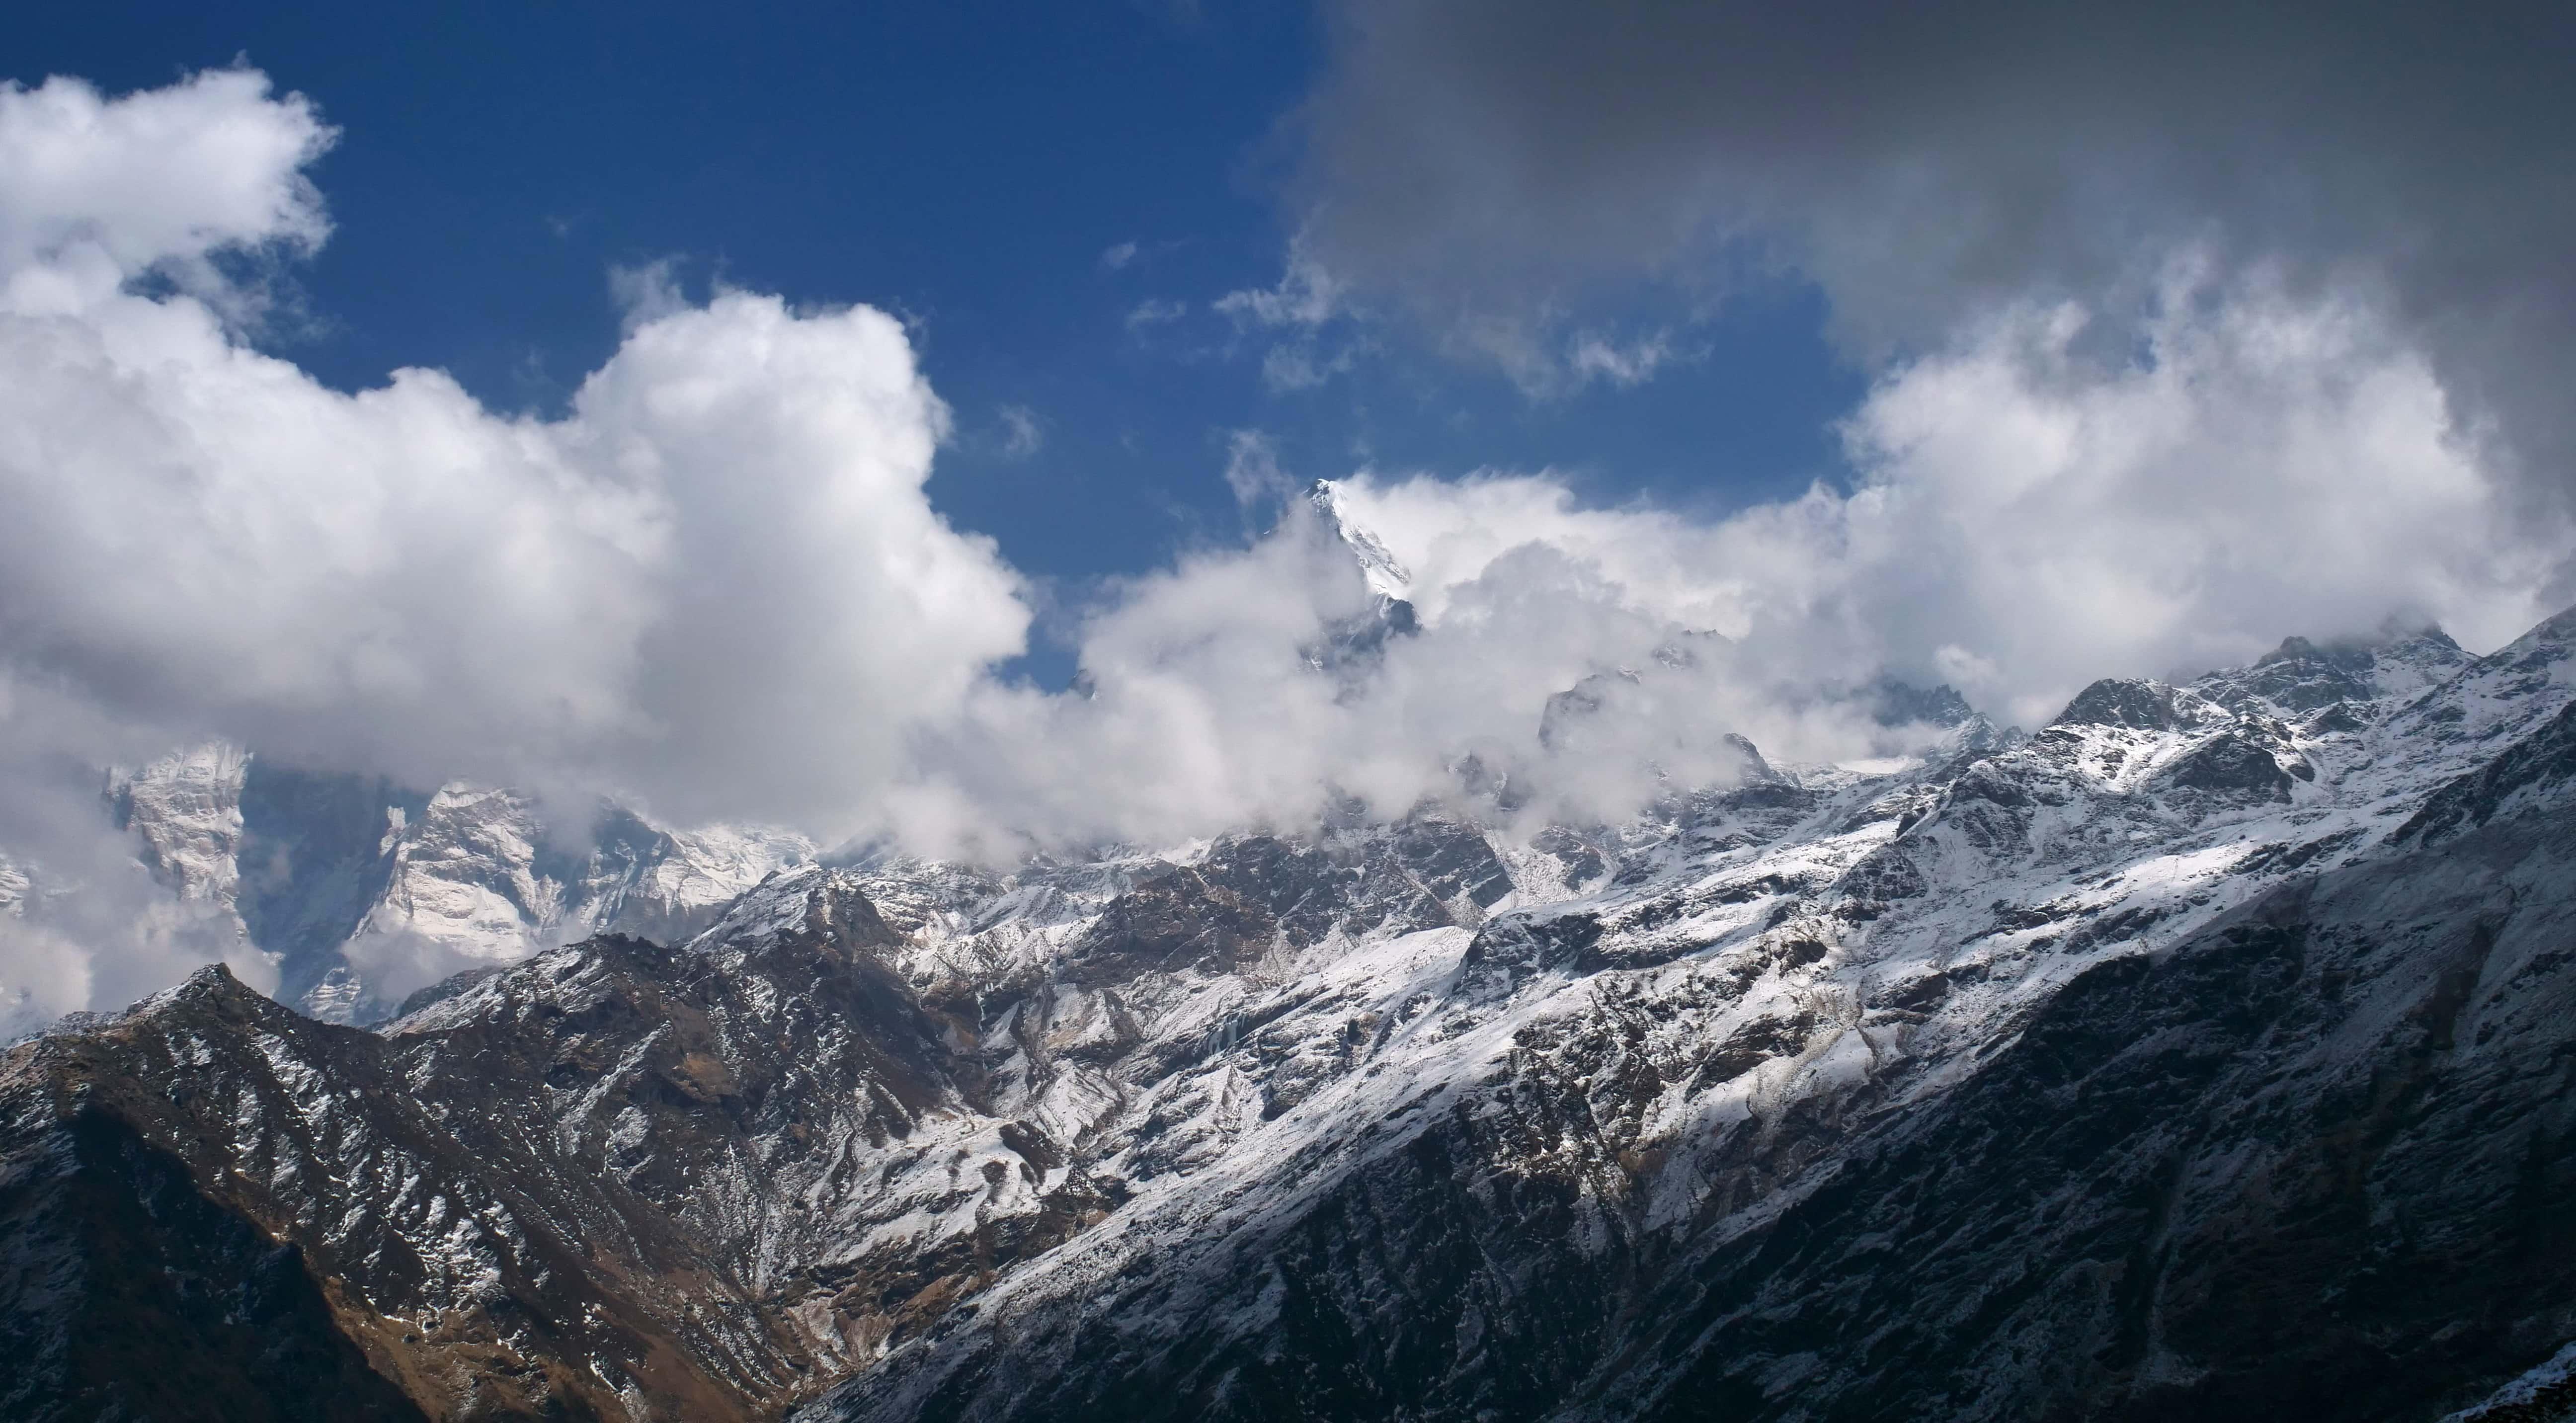 Field Recording nepal himalaya David kamp studiokamp mountain ridge